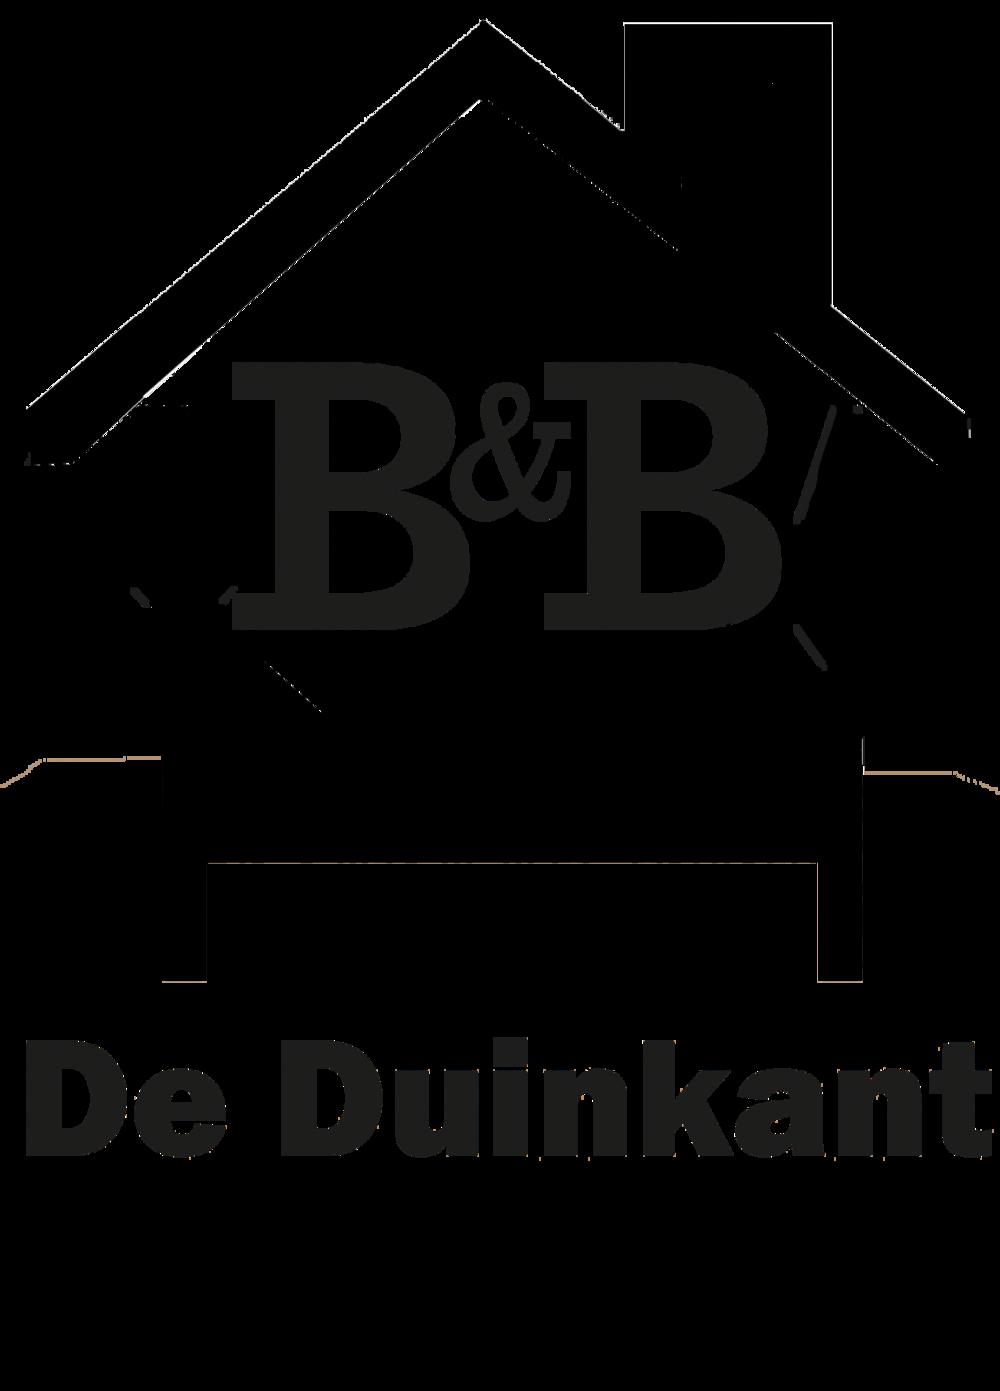 De Duinkant B&B